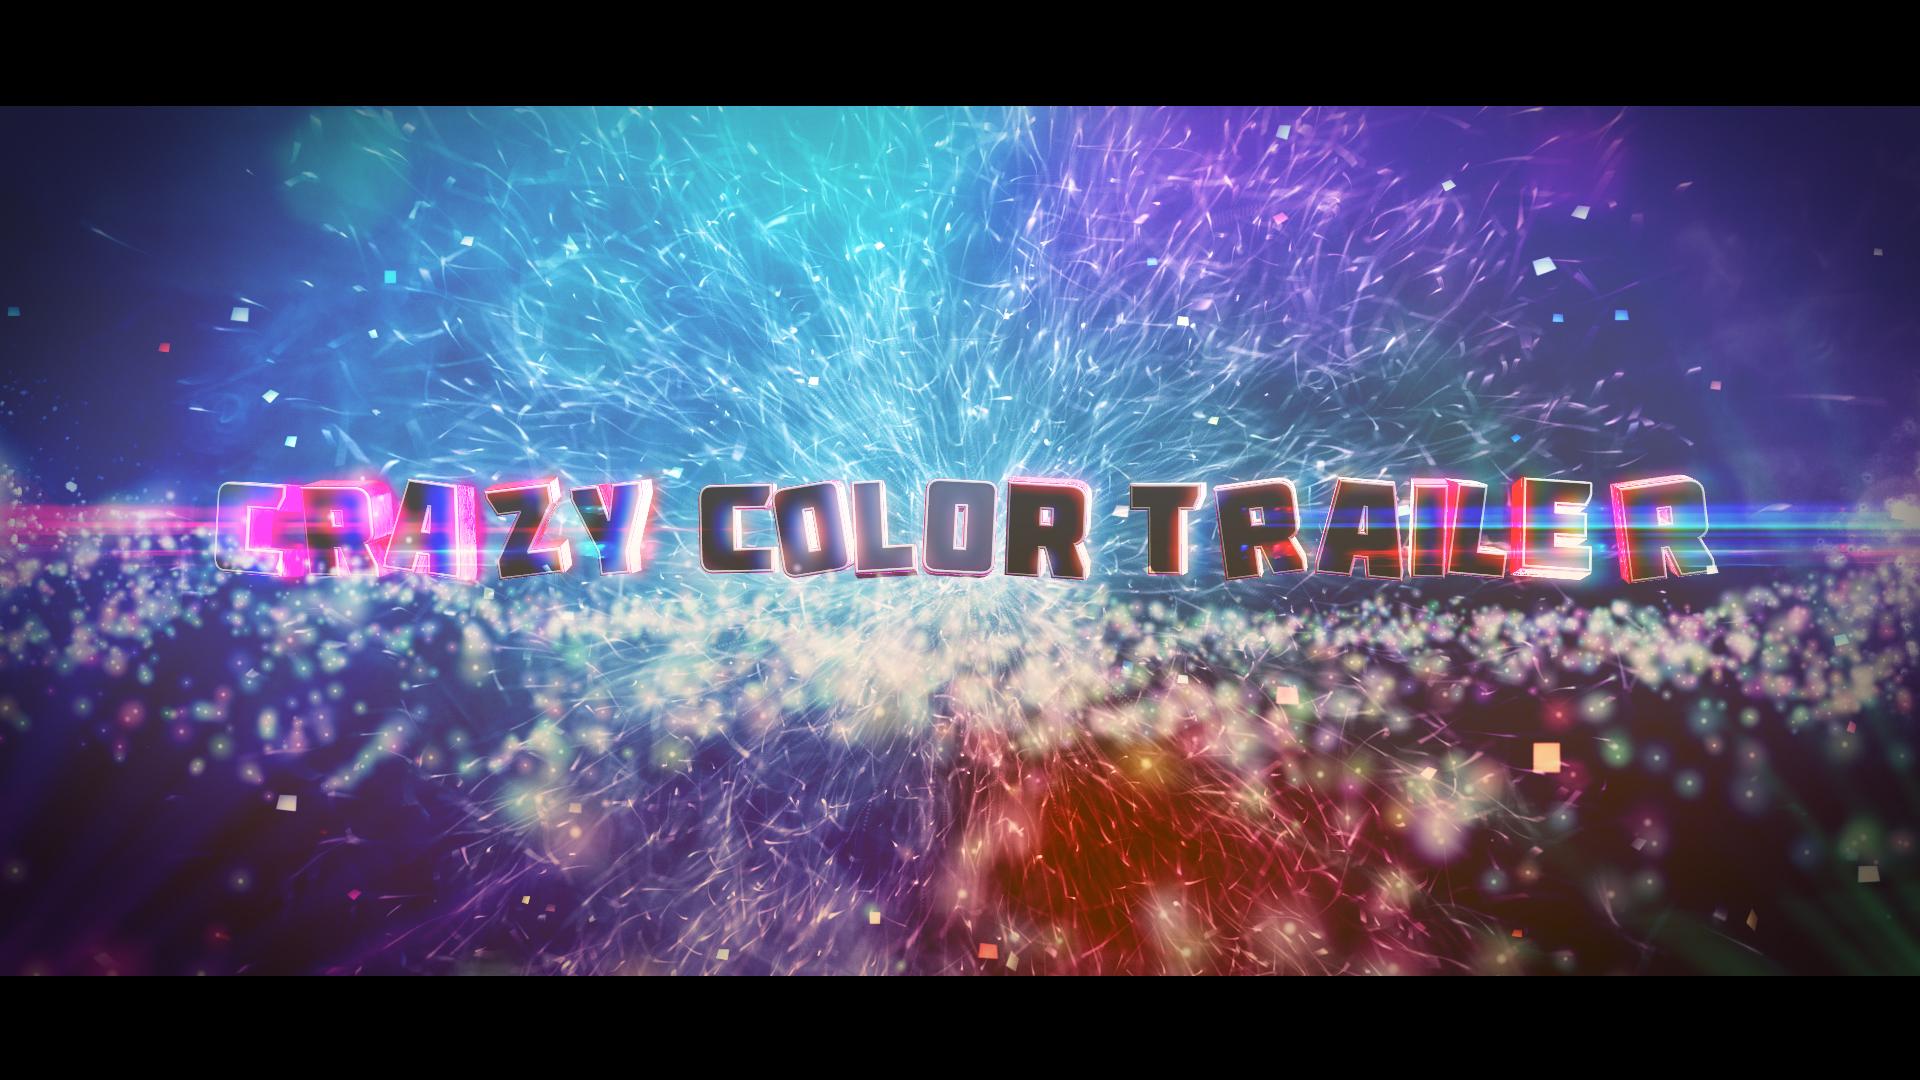 Crazy Color Trailer - 3